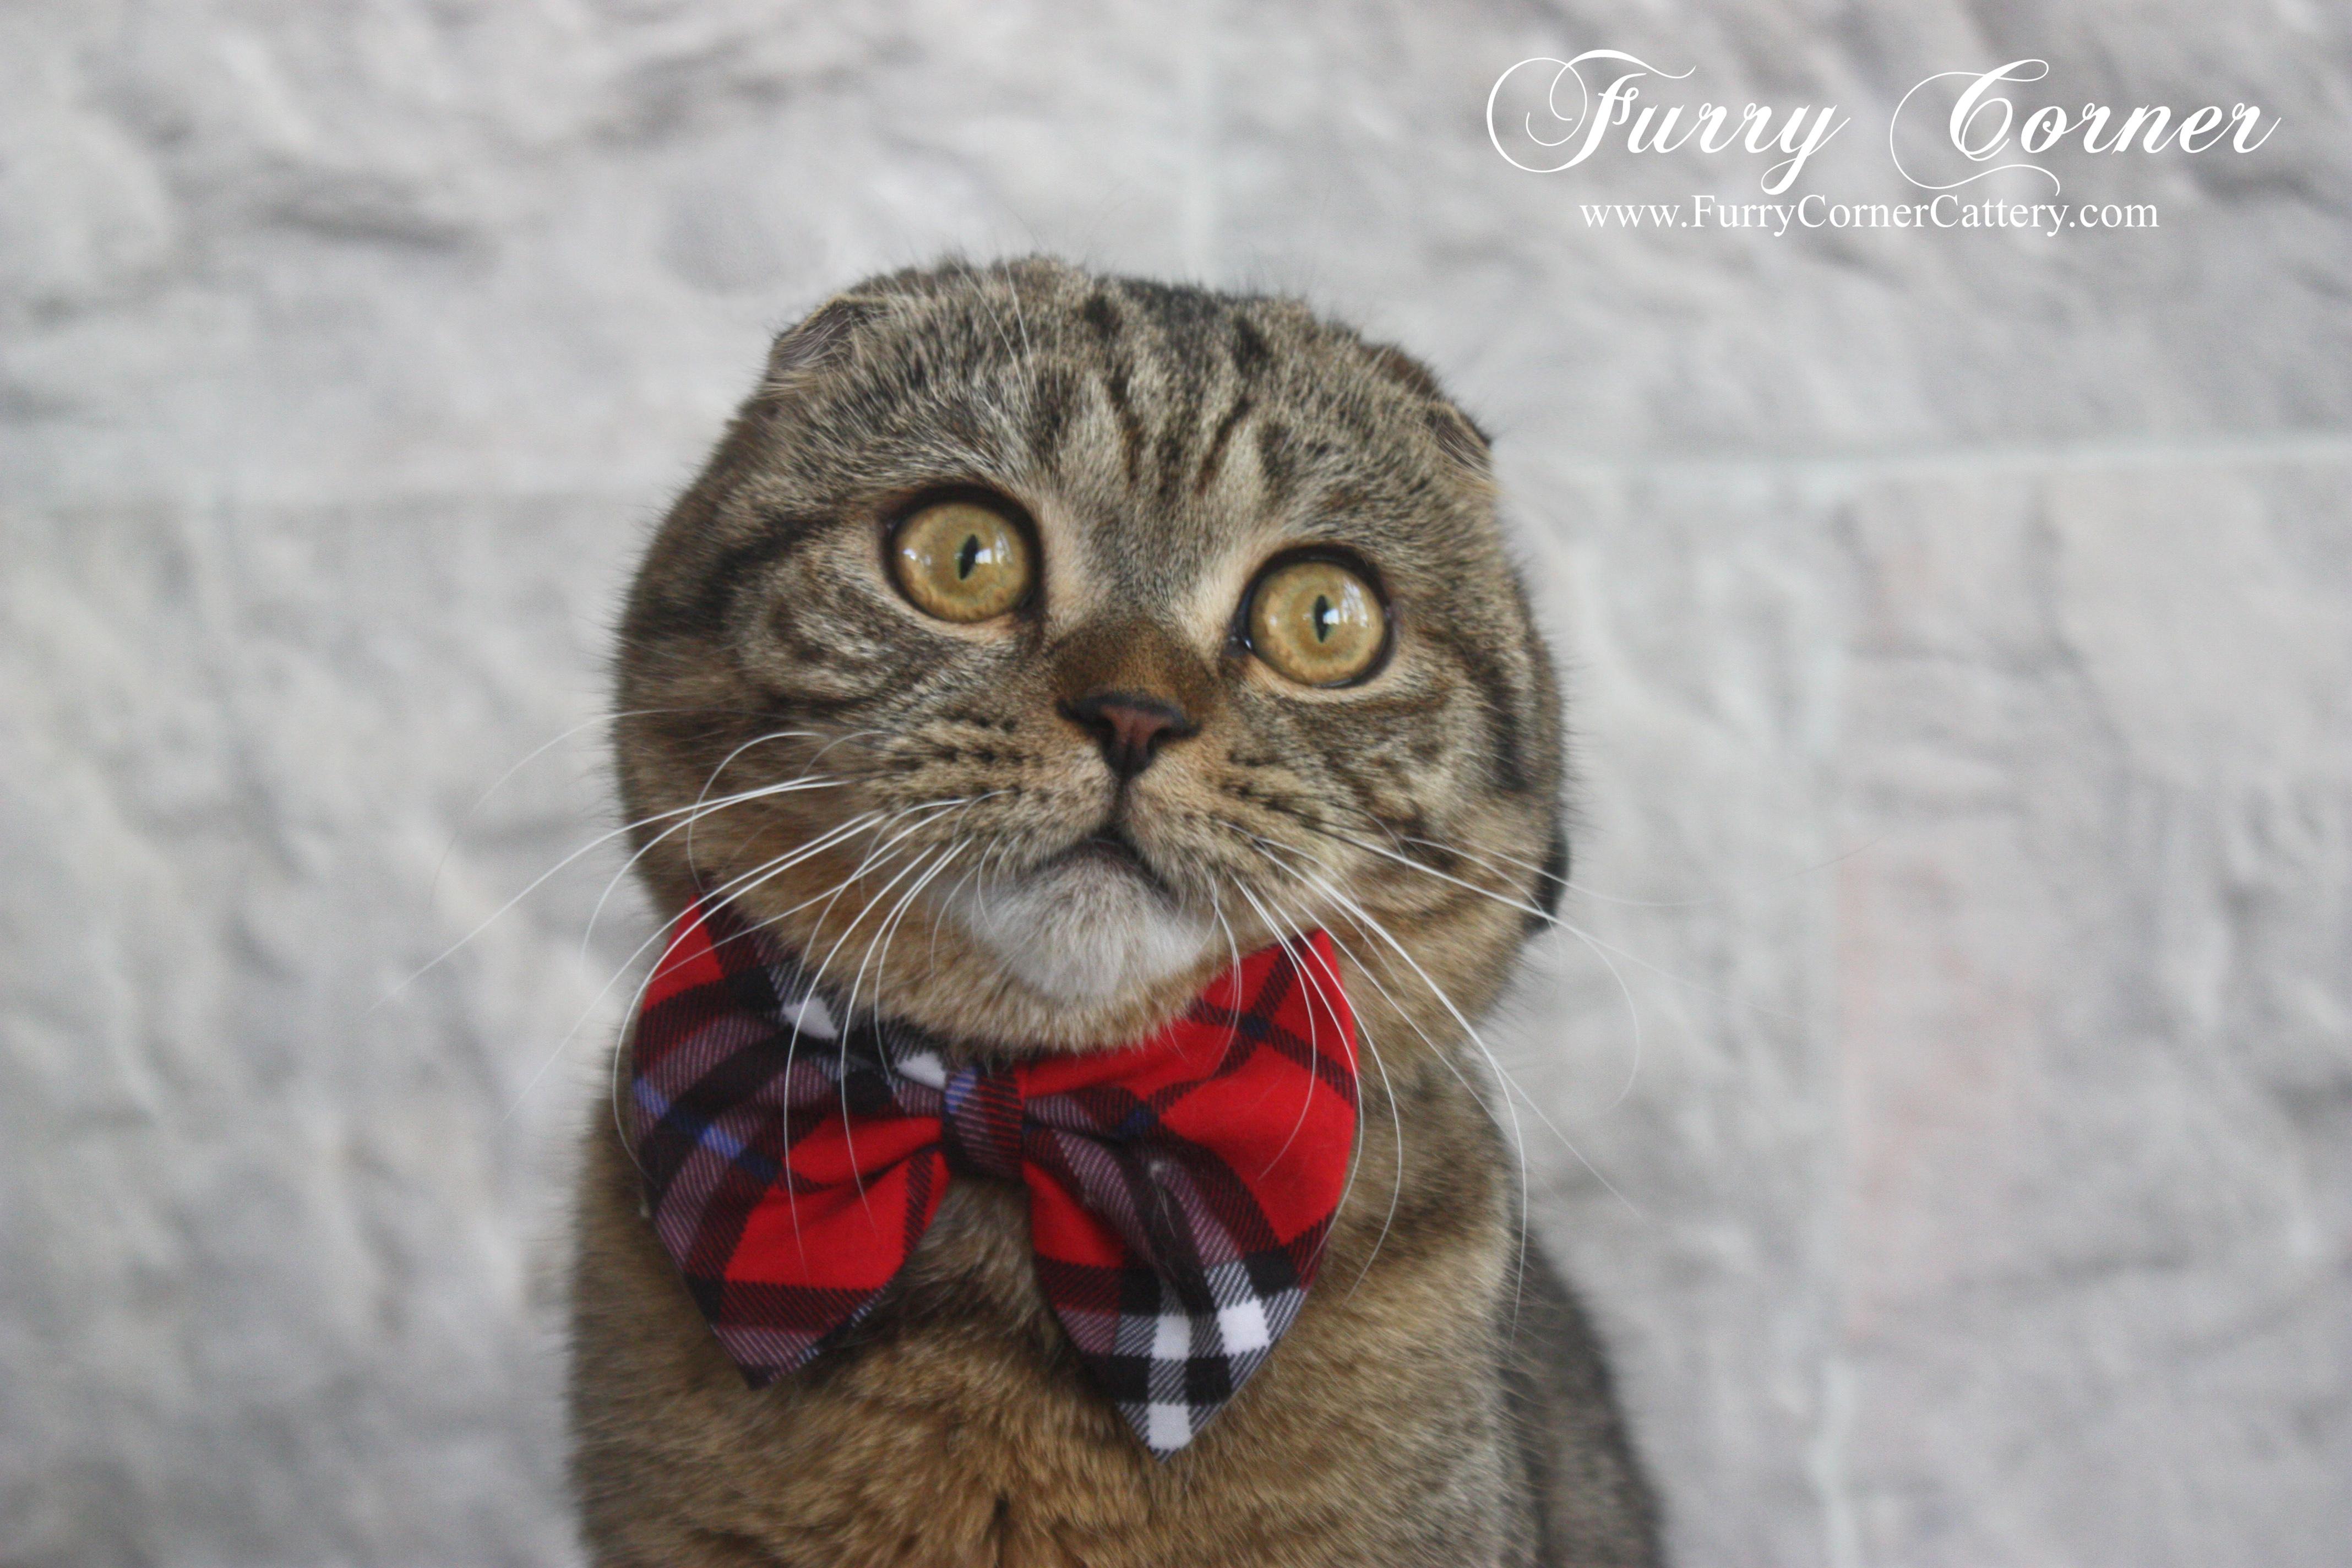 Фурри кошки 18 10 фотография